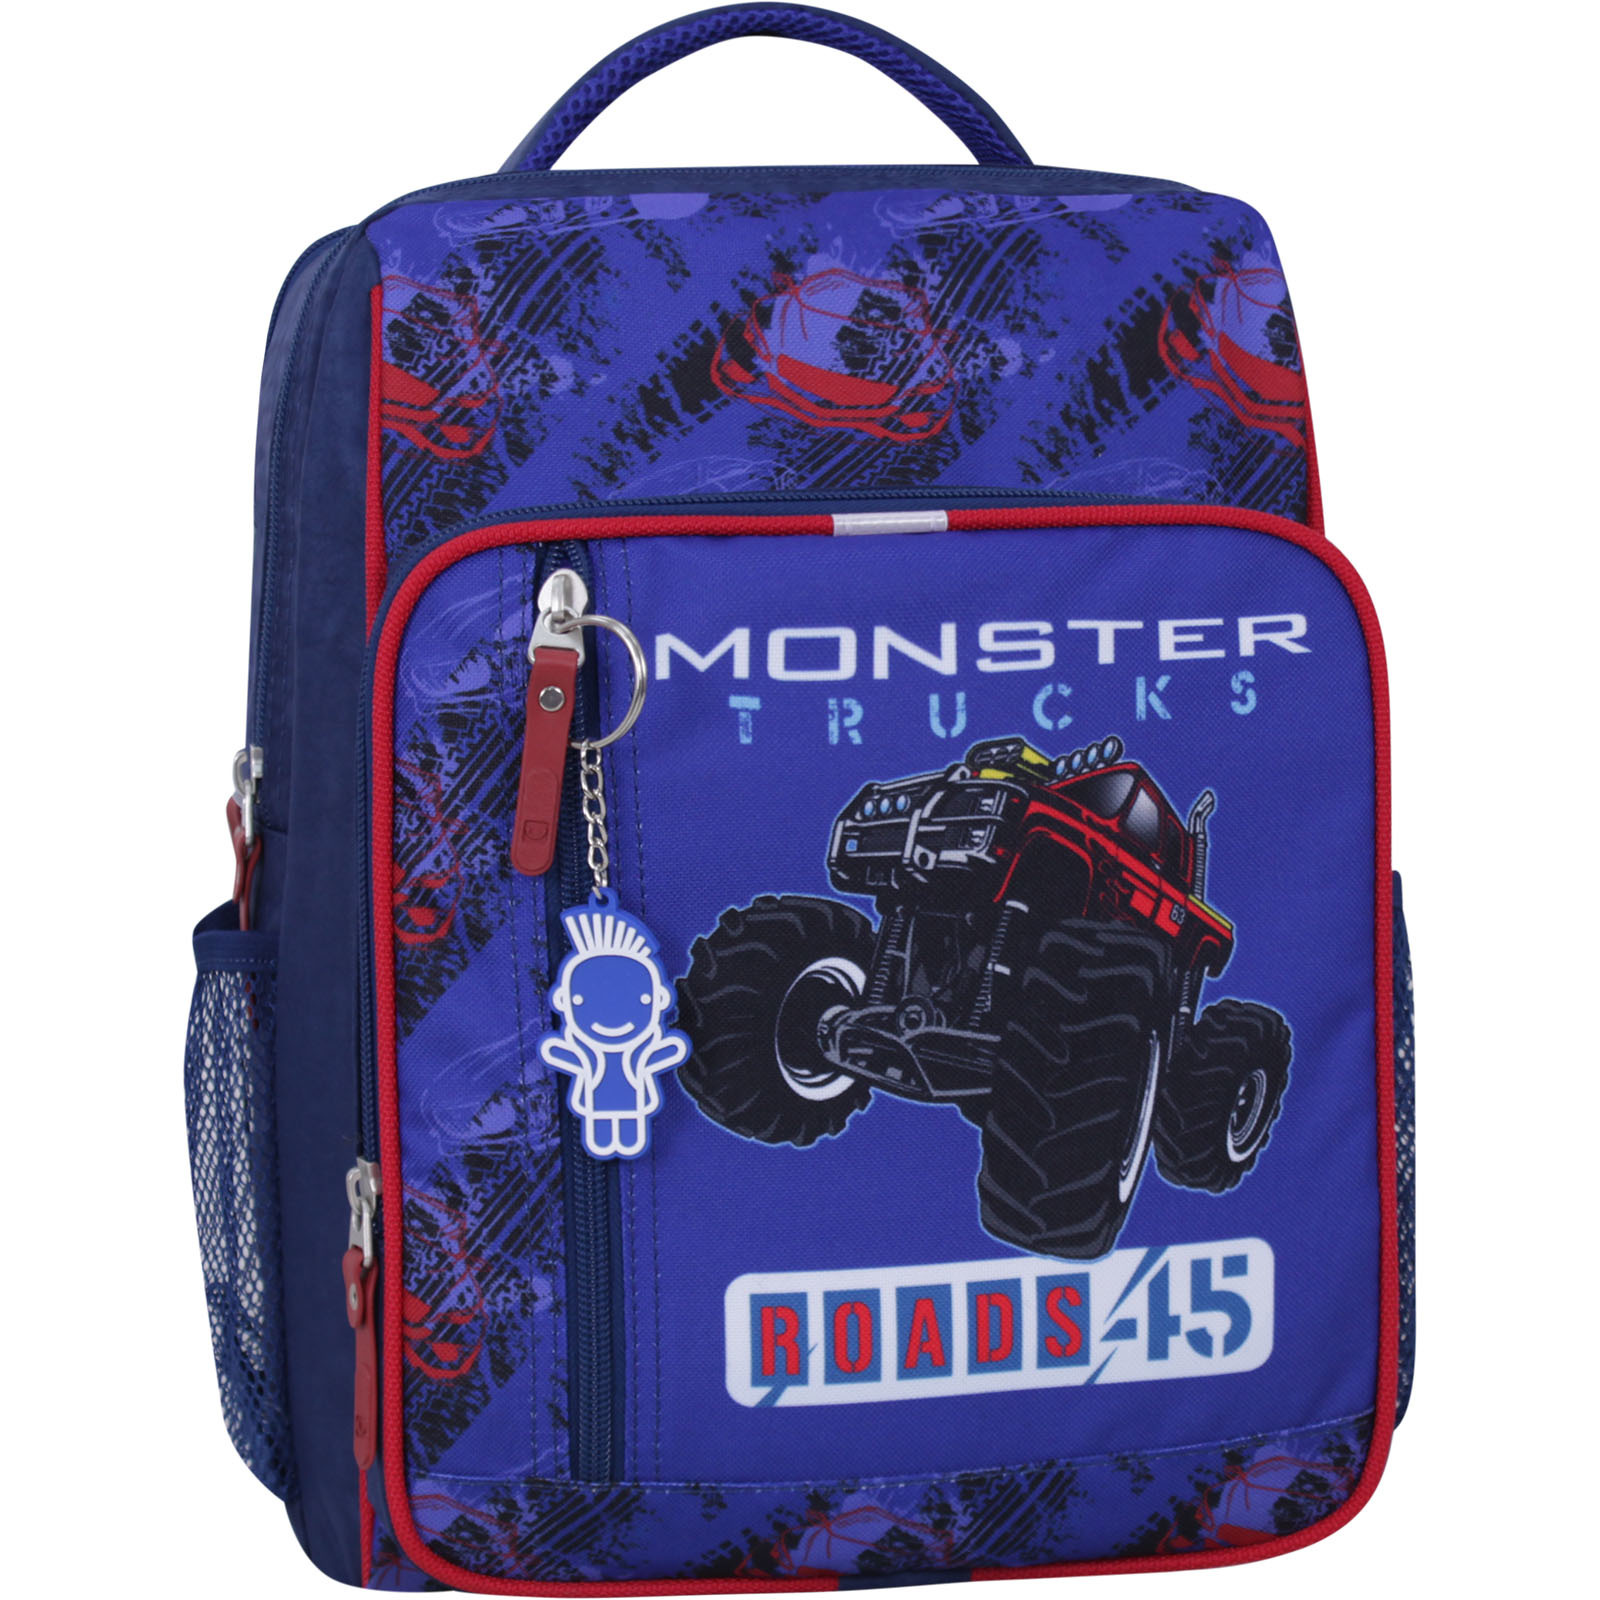 Школьные рюкзаки Рюкзак школьный Bagland Школьник 8 л. синий 898 (0012870) IMG_0246_суб_898_-1600.jpg